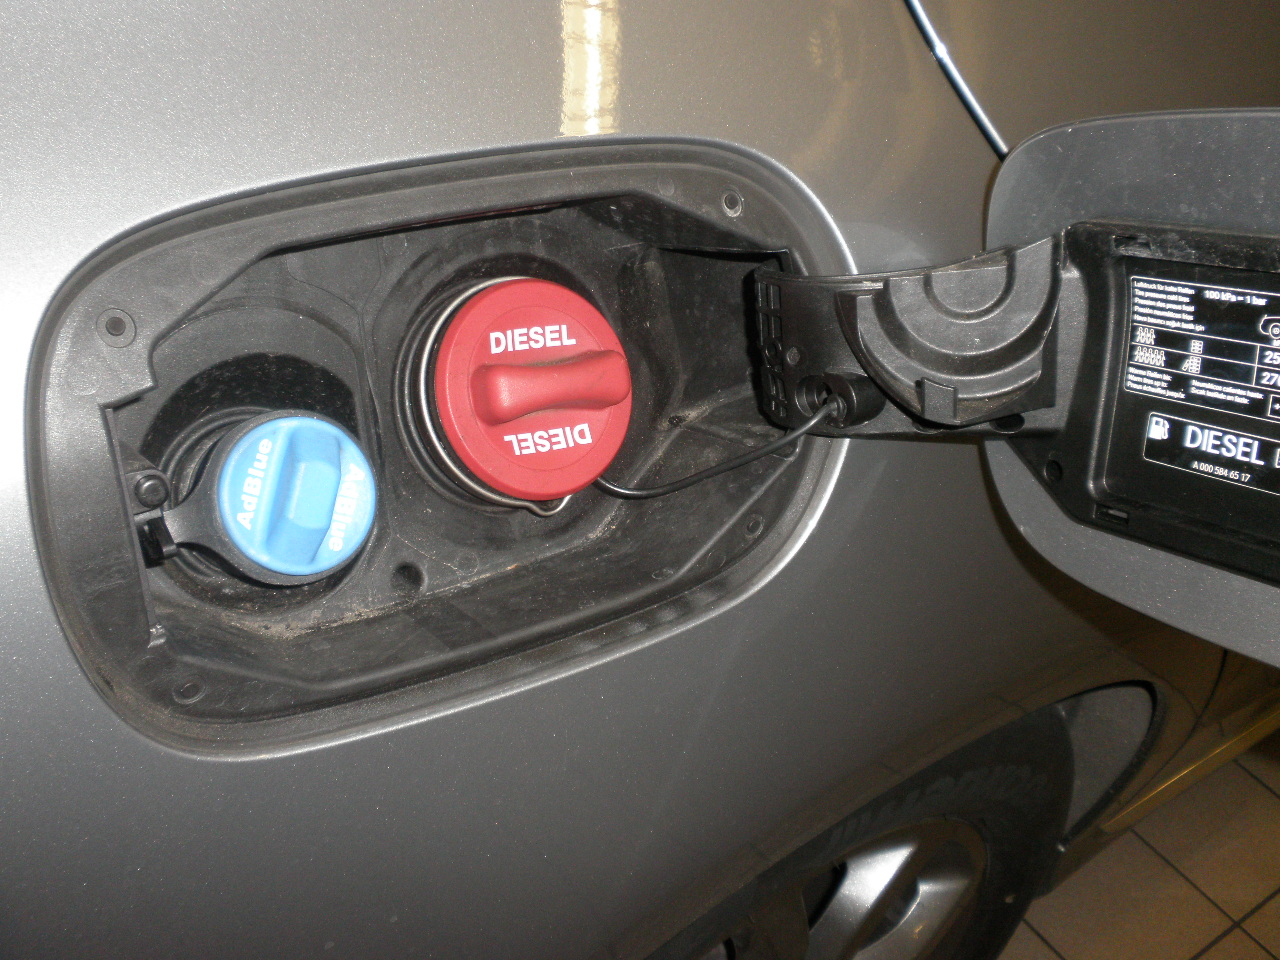 Drive Car With Fuel Cap Open